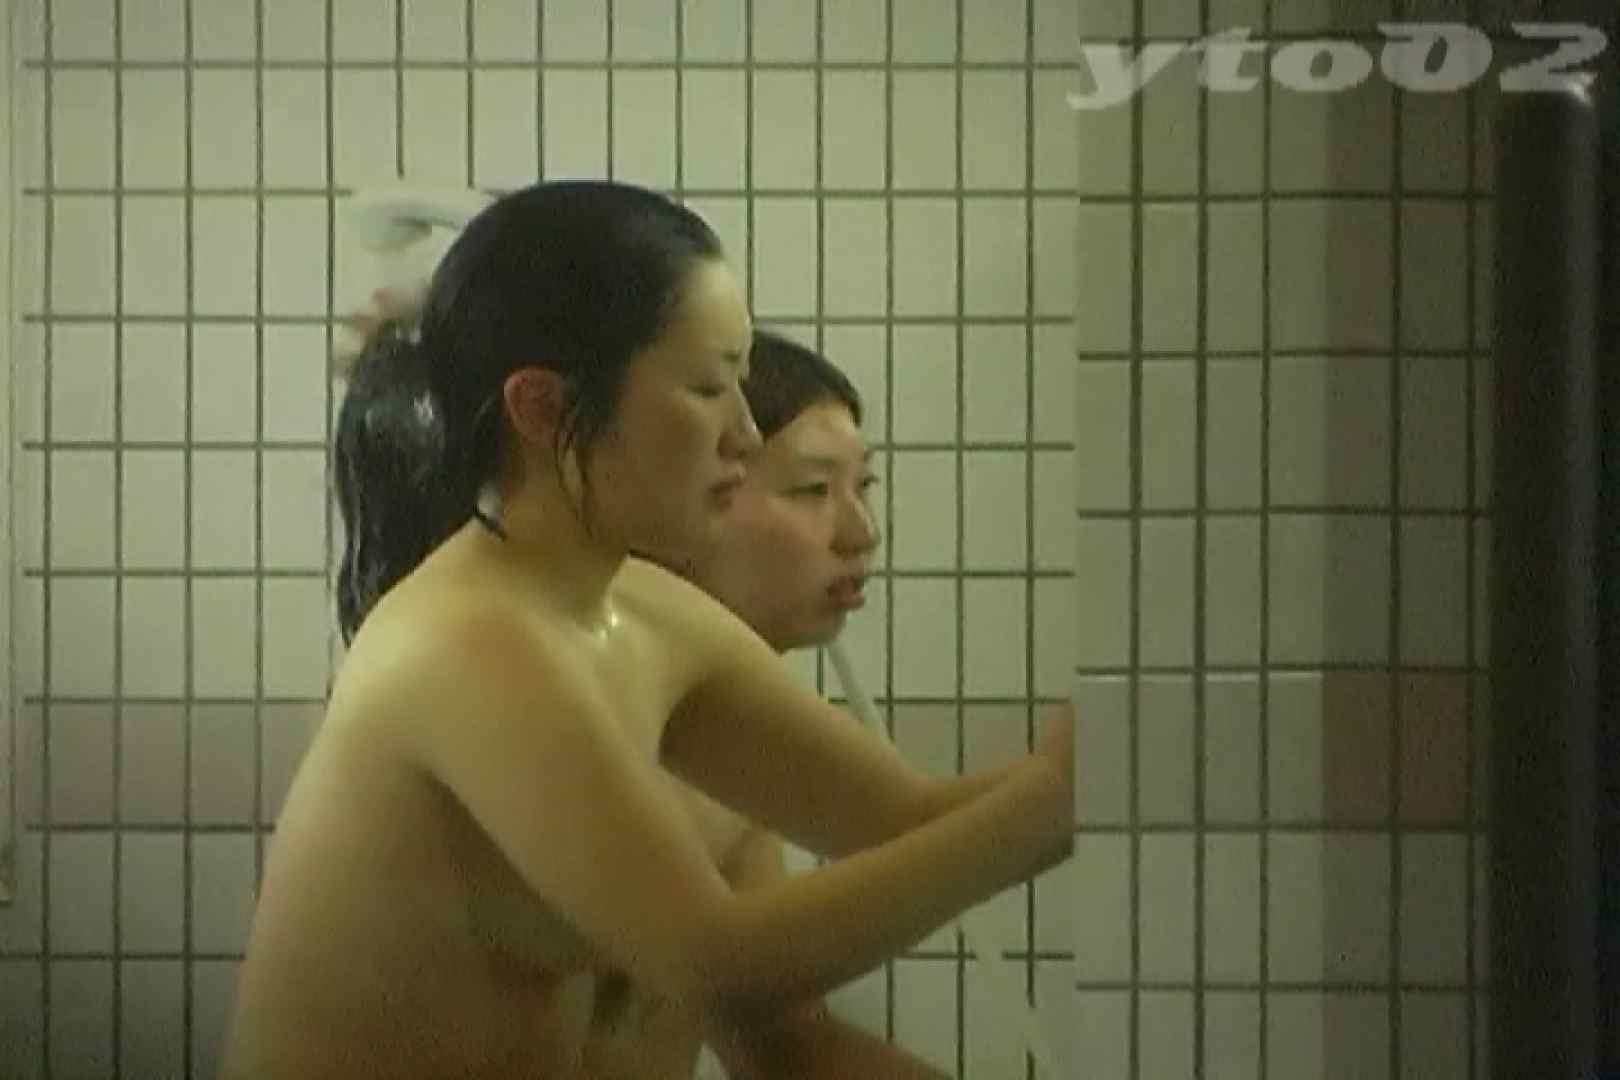 ▲復活限定▲合宿ホテル女風呂盗撮 Vol.11 入浴  79pic 3